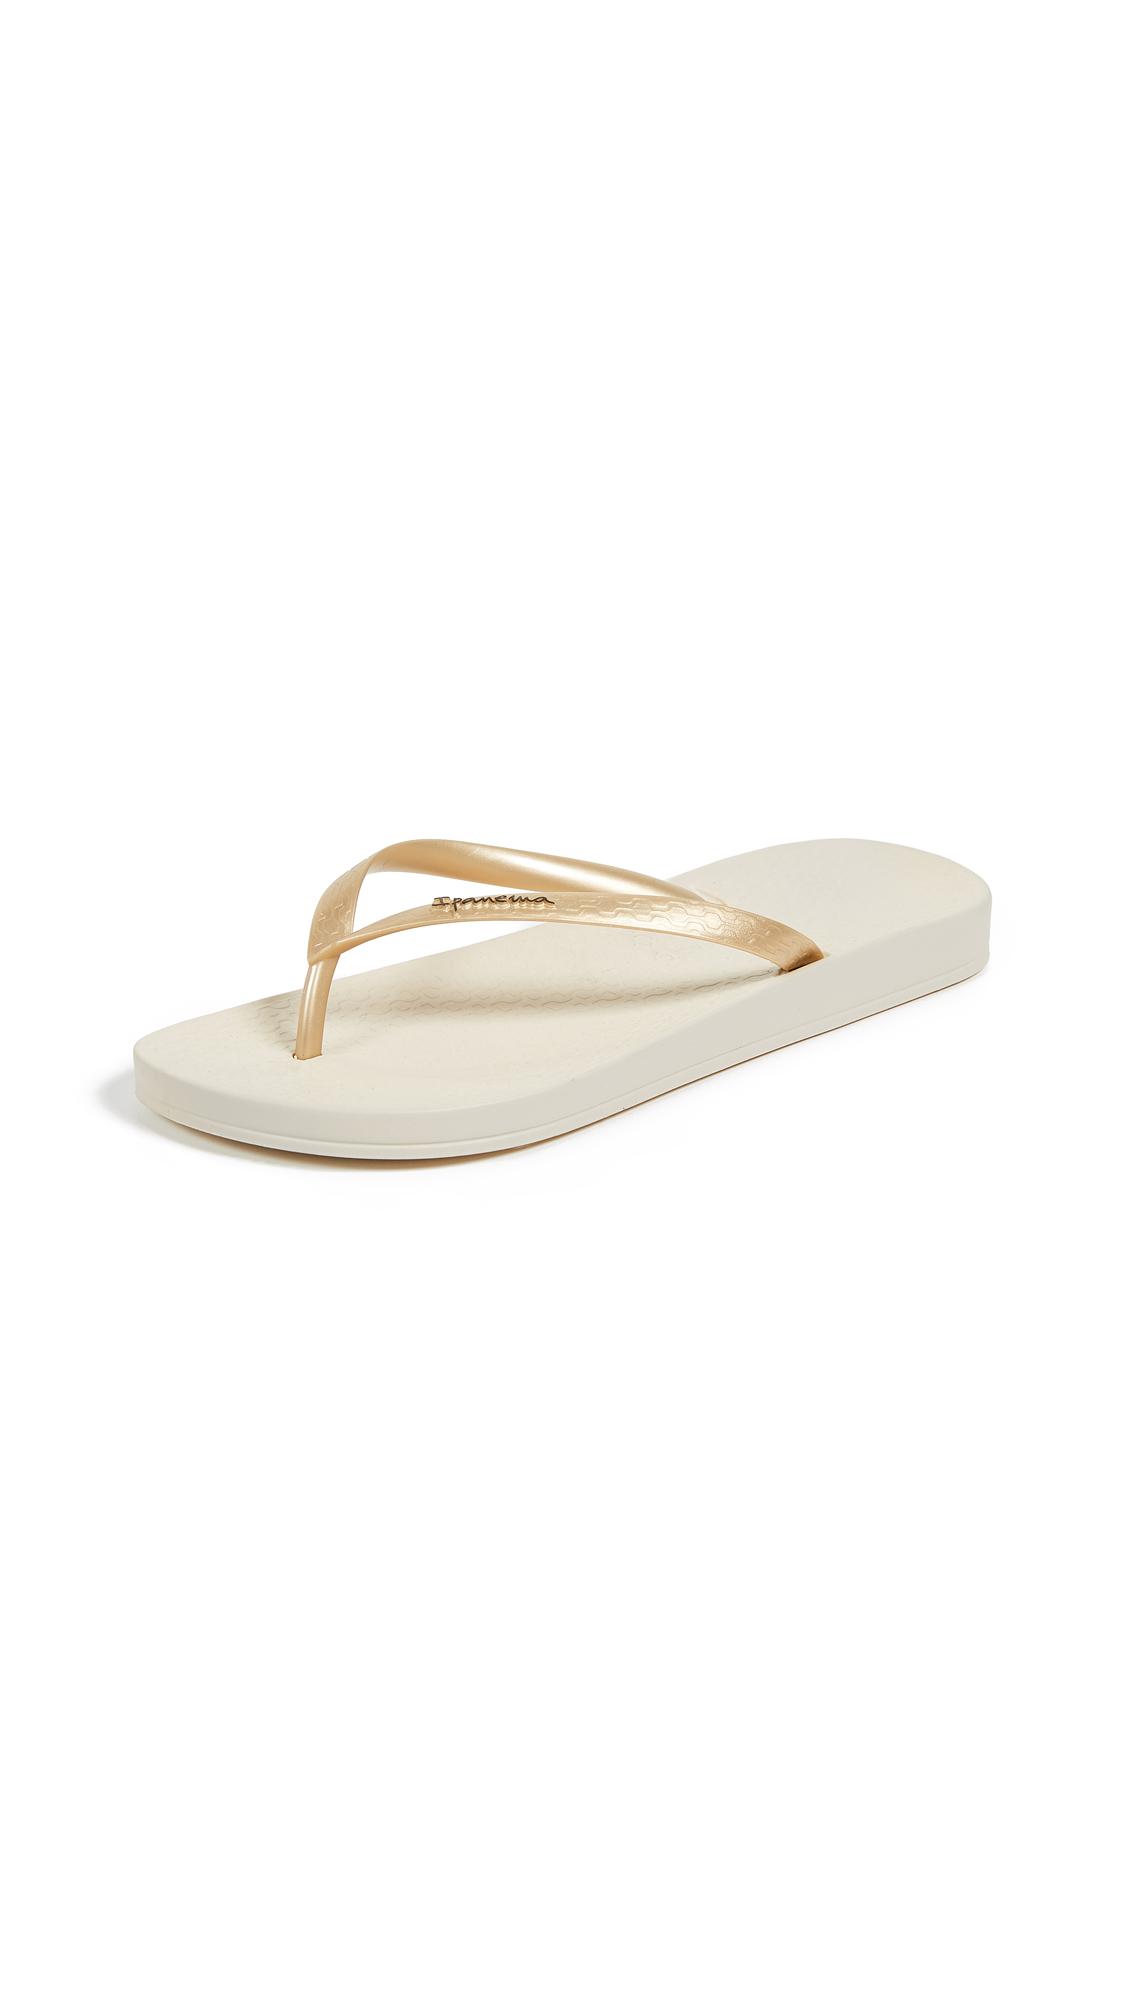 Ipanema Ana Tan Flip Flops - Beige/Gold